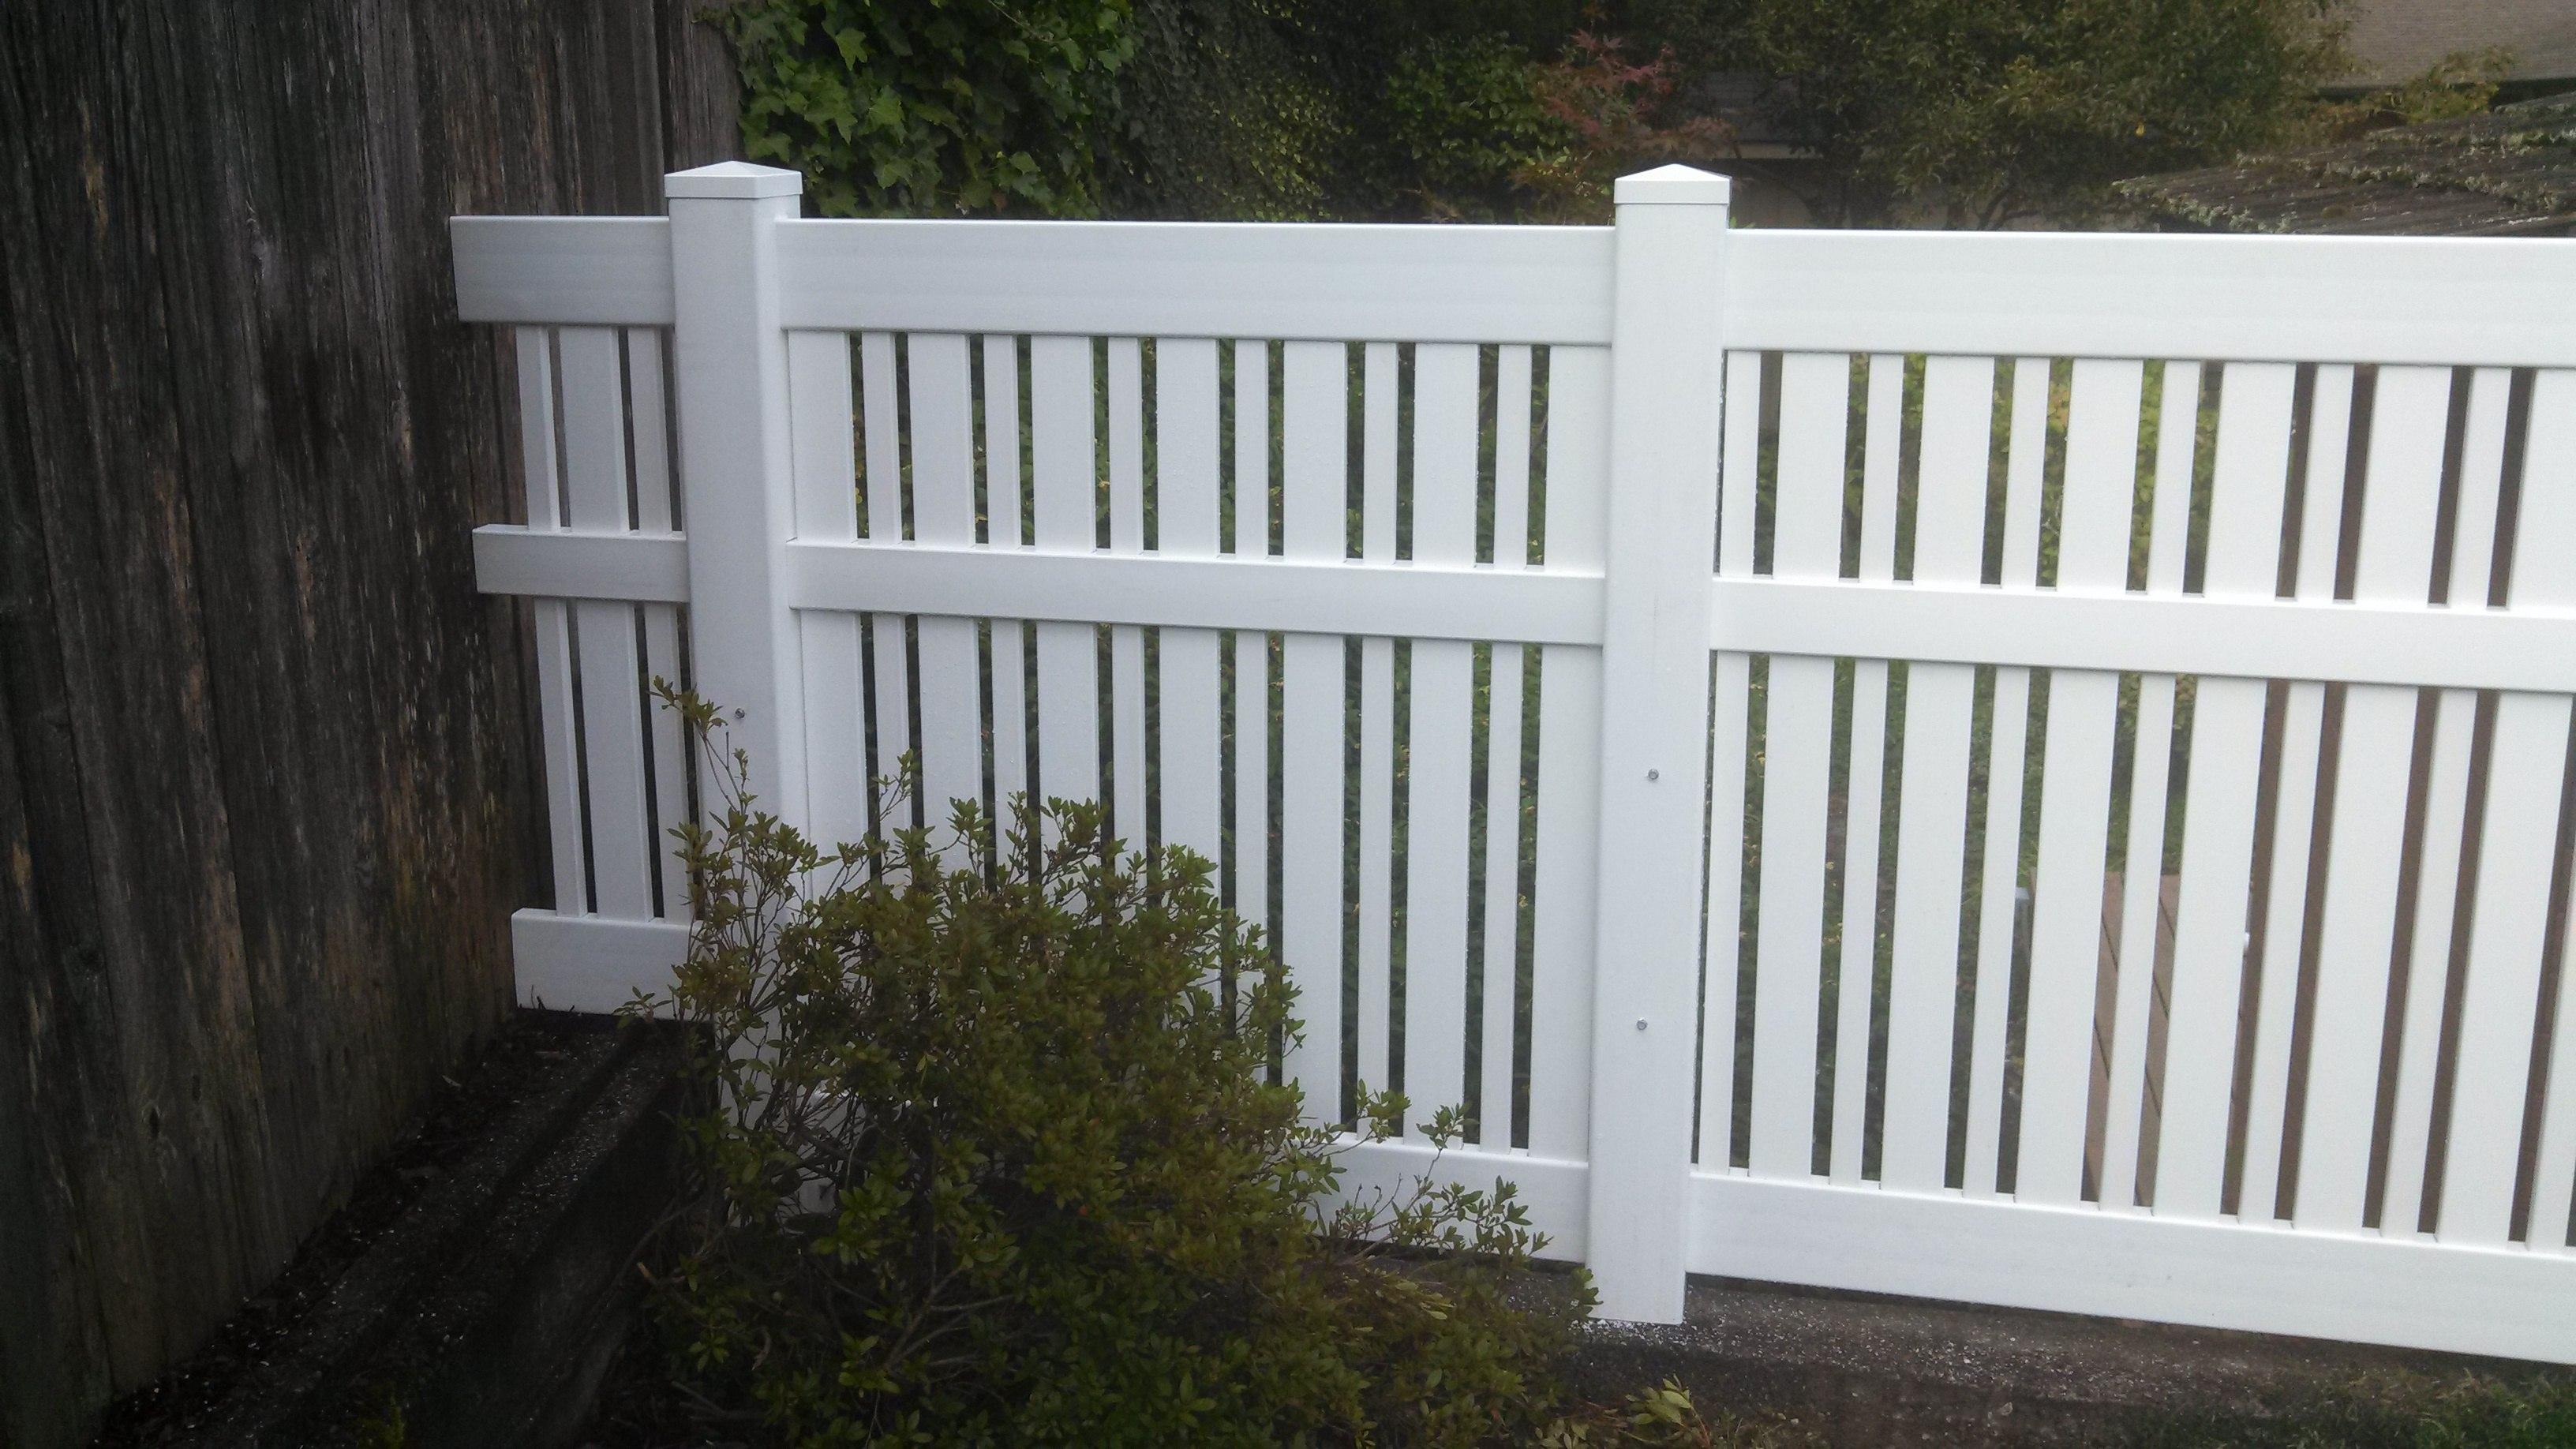 vinyl picket fence front yard. Vinyl Contemporary 2 Picket Fence Front Yard